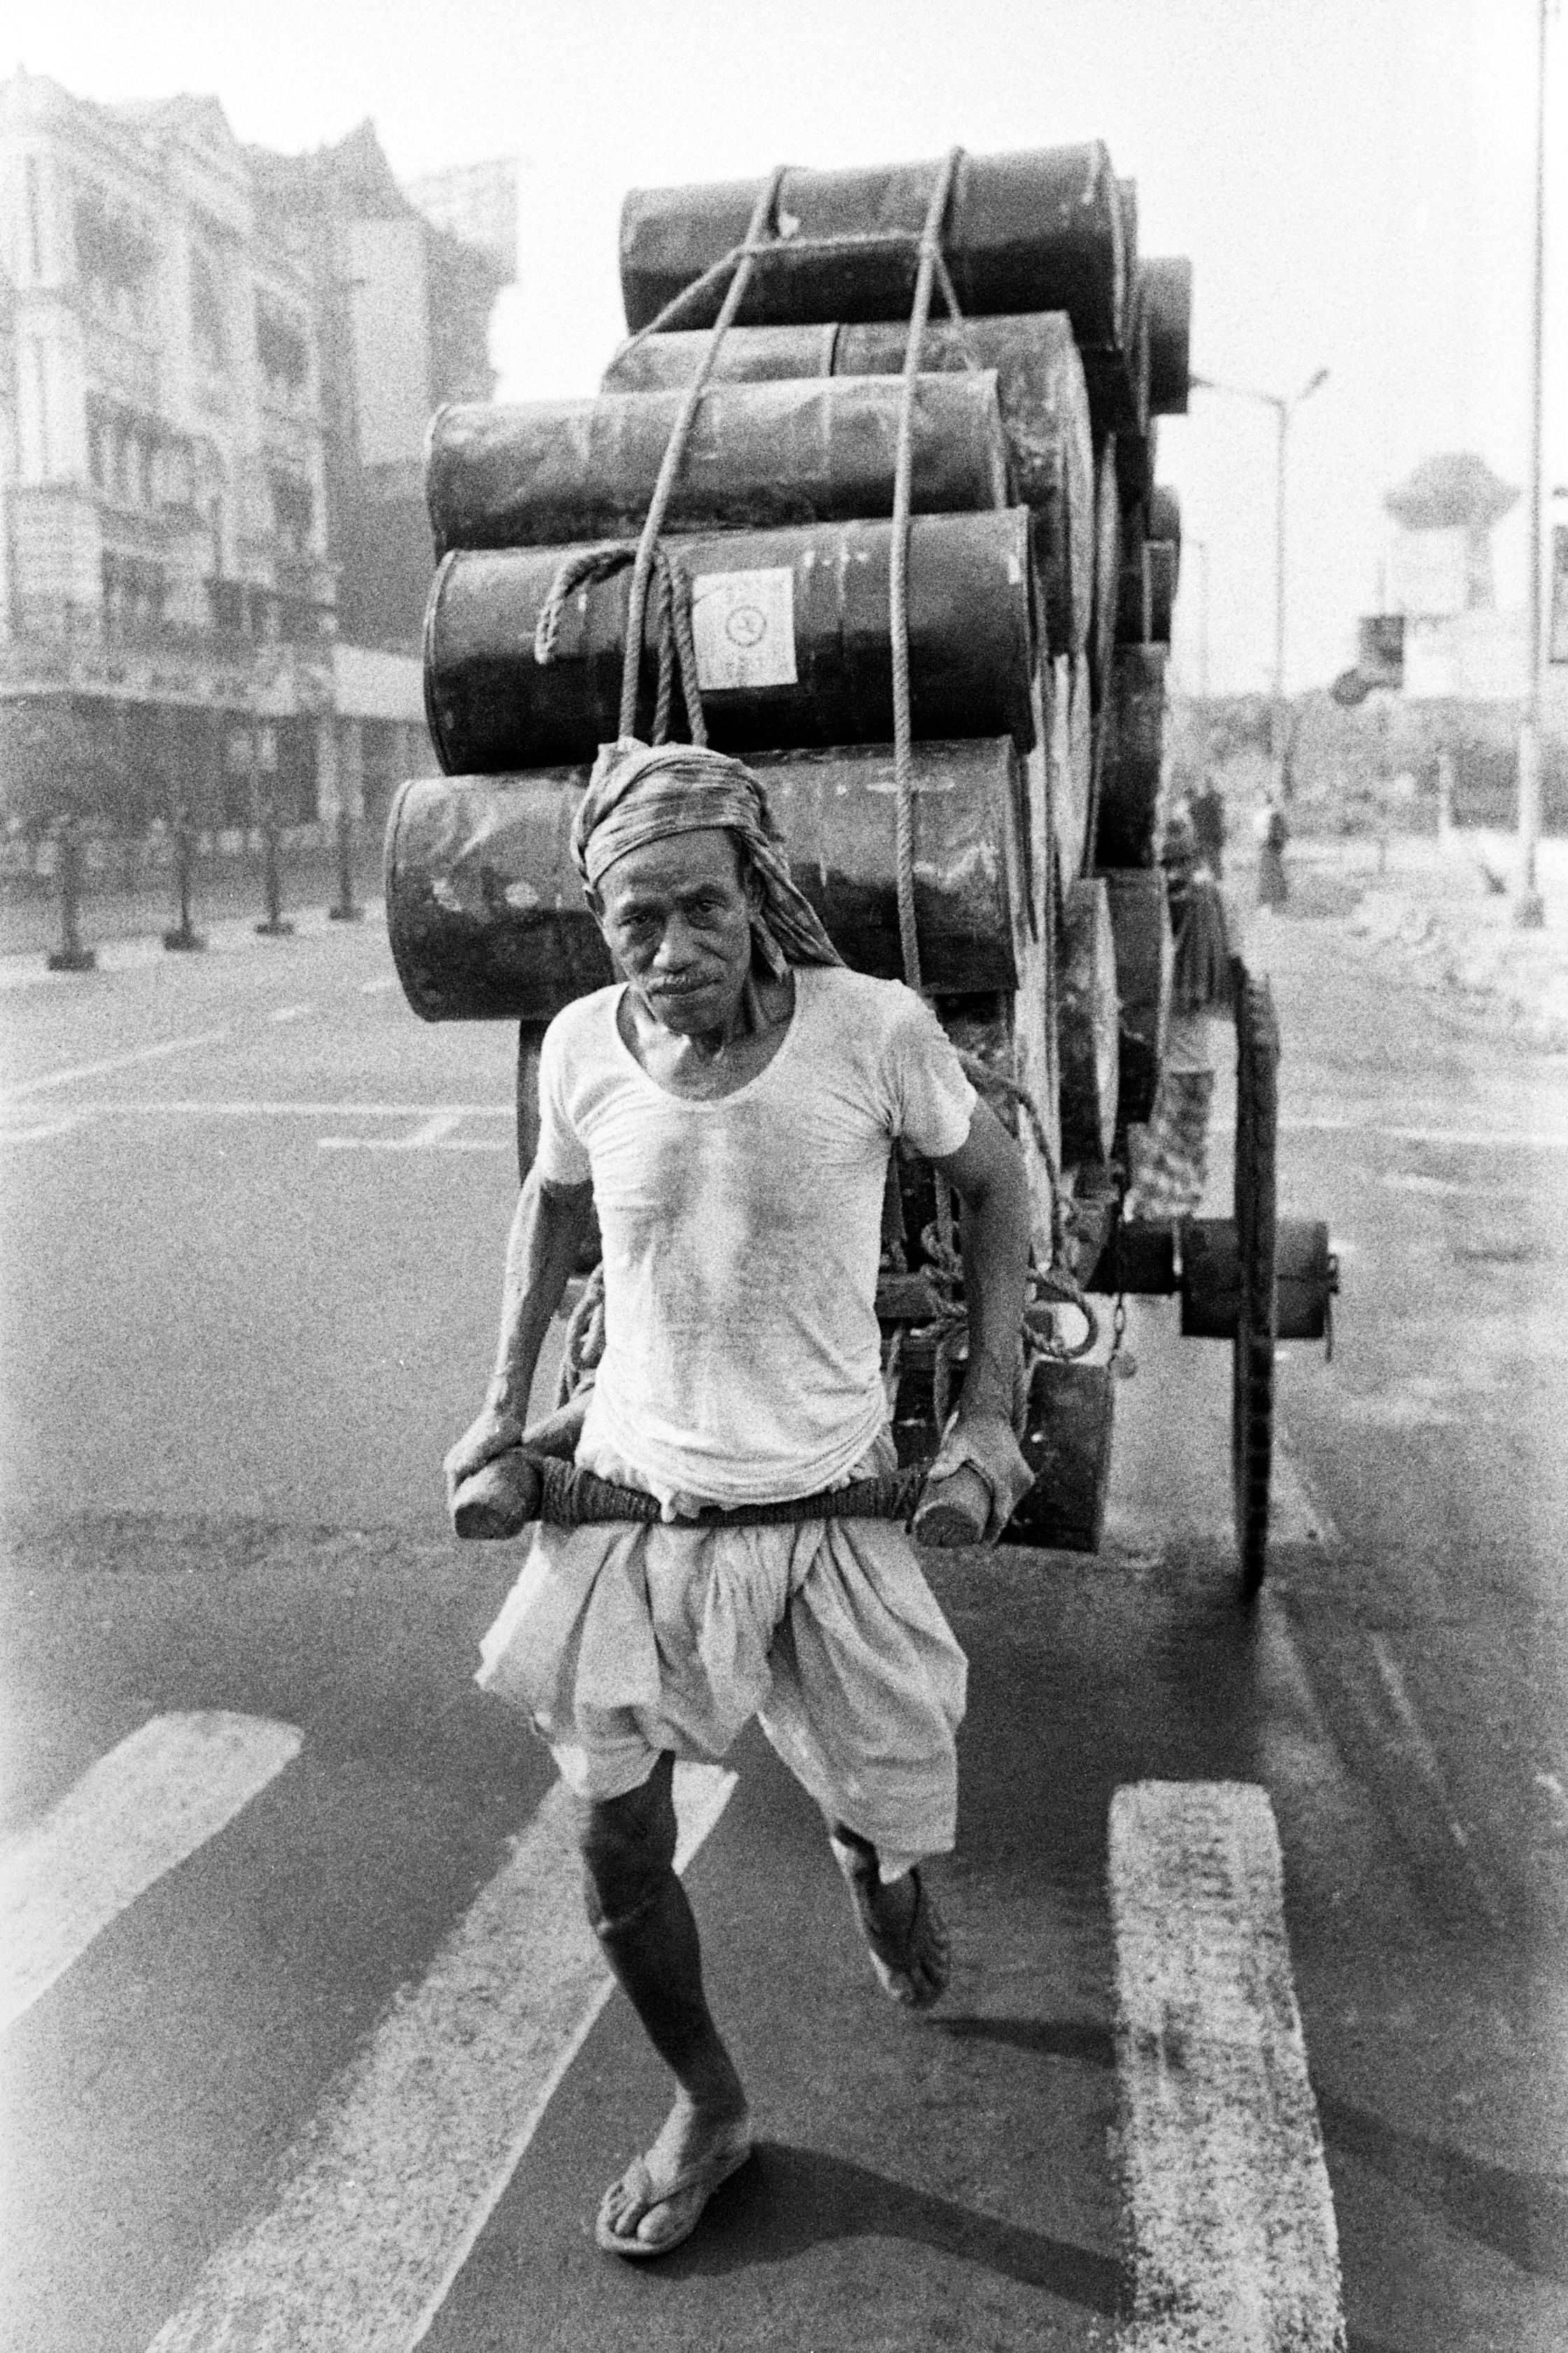 Portatori - Kolkata: Stefano Cardone Photographer Reportage